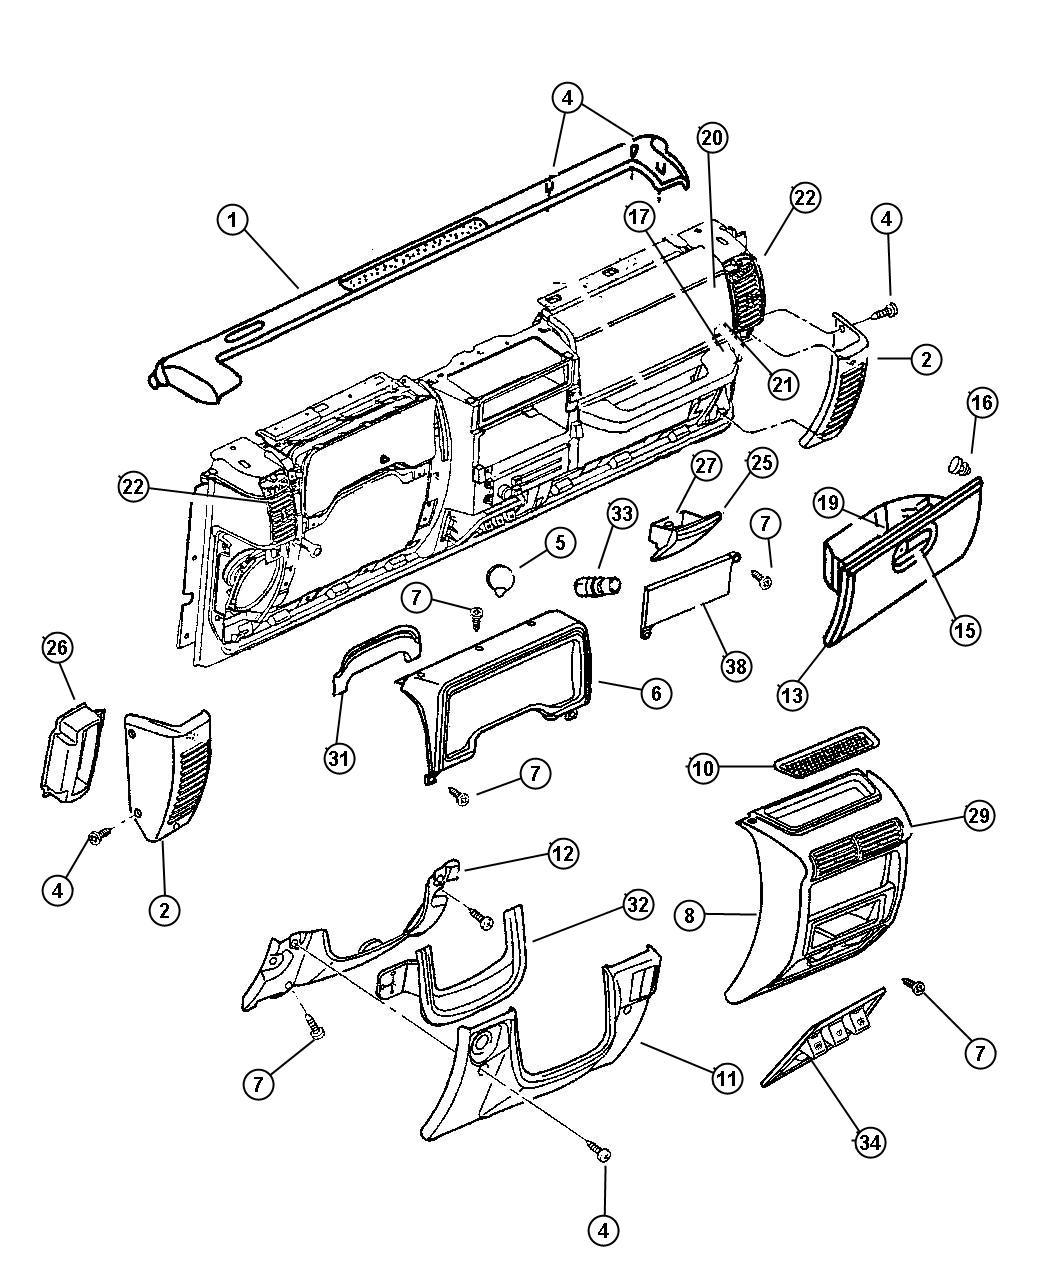 Jeep Wrangler Strap Glove Box Door Stop Check Glovebox Trim O0